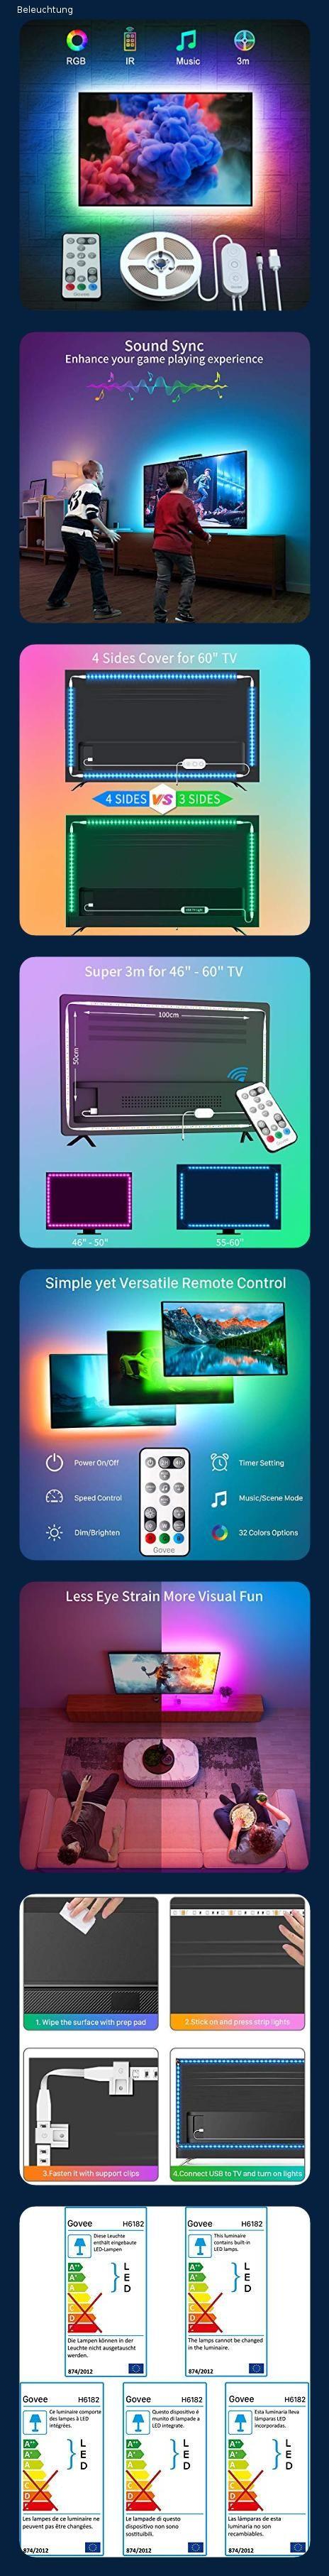 Govee 3M USB Strip Lichtband mit 3m LED TV Hintergrundbeleuchtung